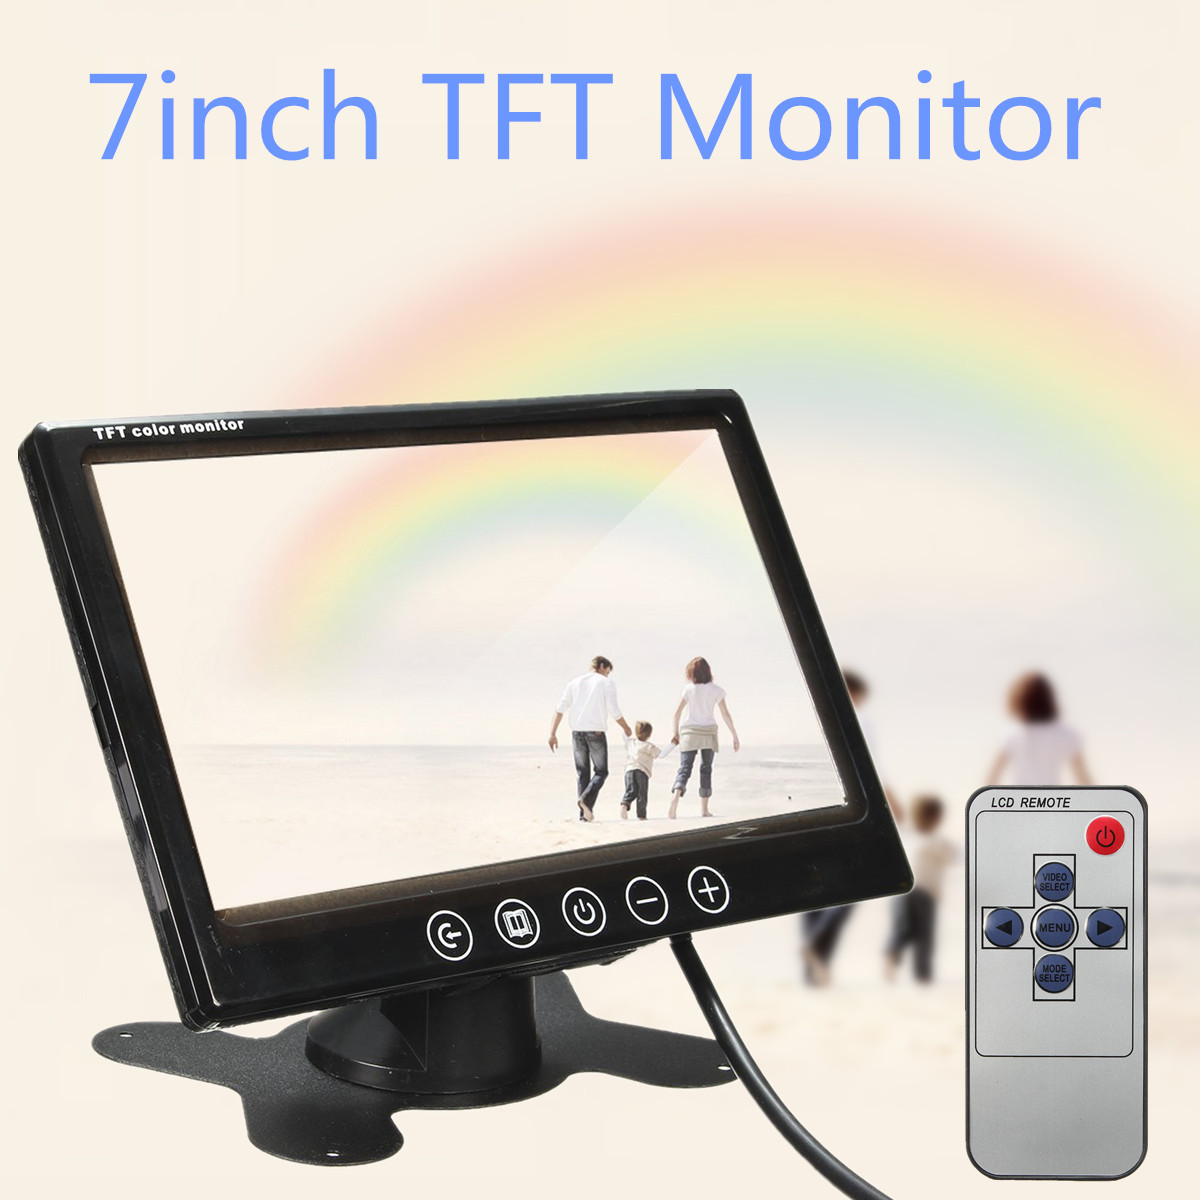 где купить 7 inch TFT LCD Car Monitor Rearview Screen HDMI VGA DVD Digital Display HD Resolution Parking Backup Camera +Remote Control дешево